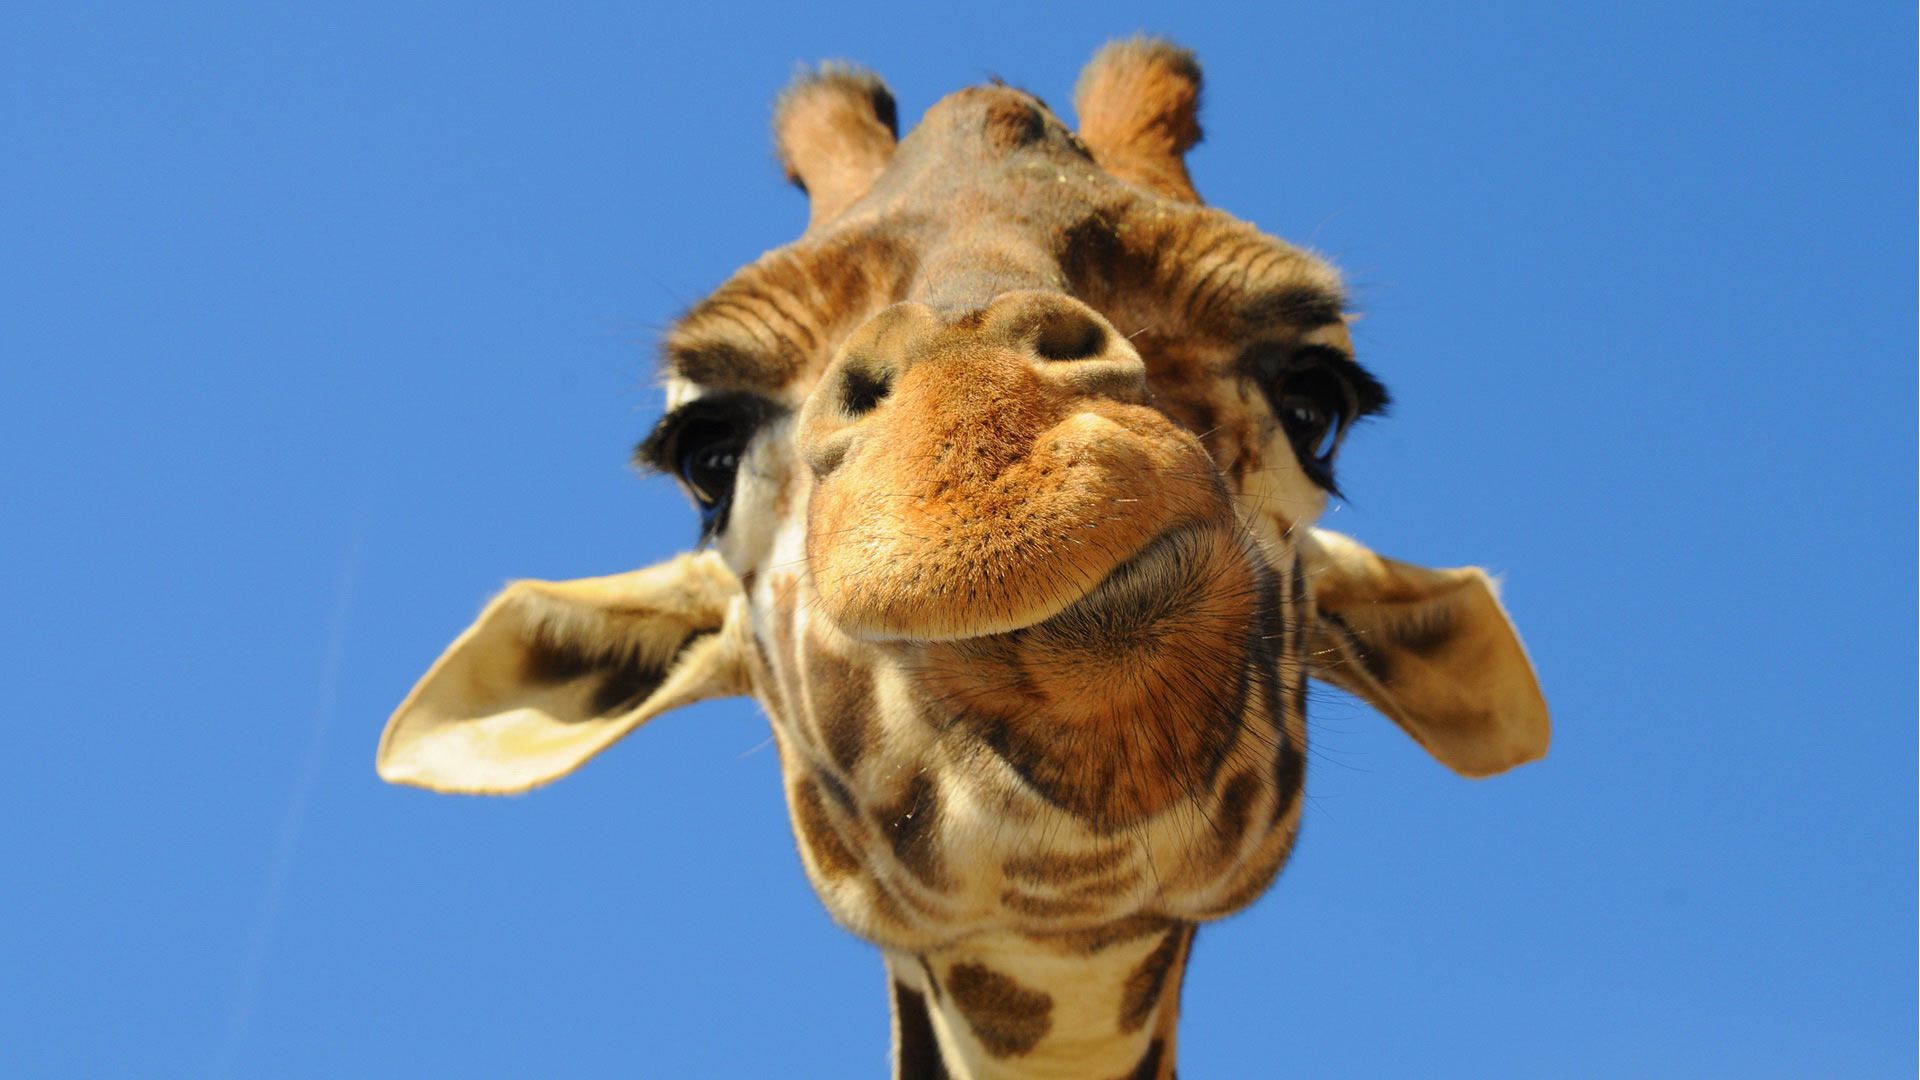 embracing my giraffe obsession